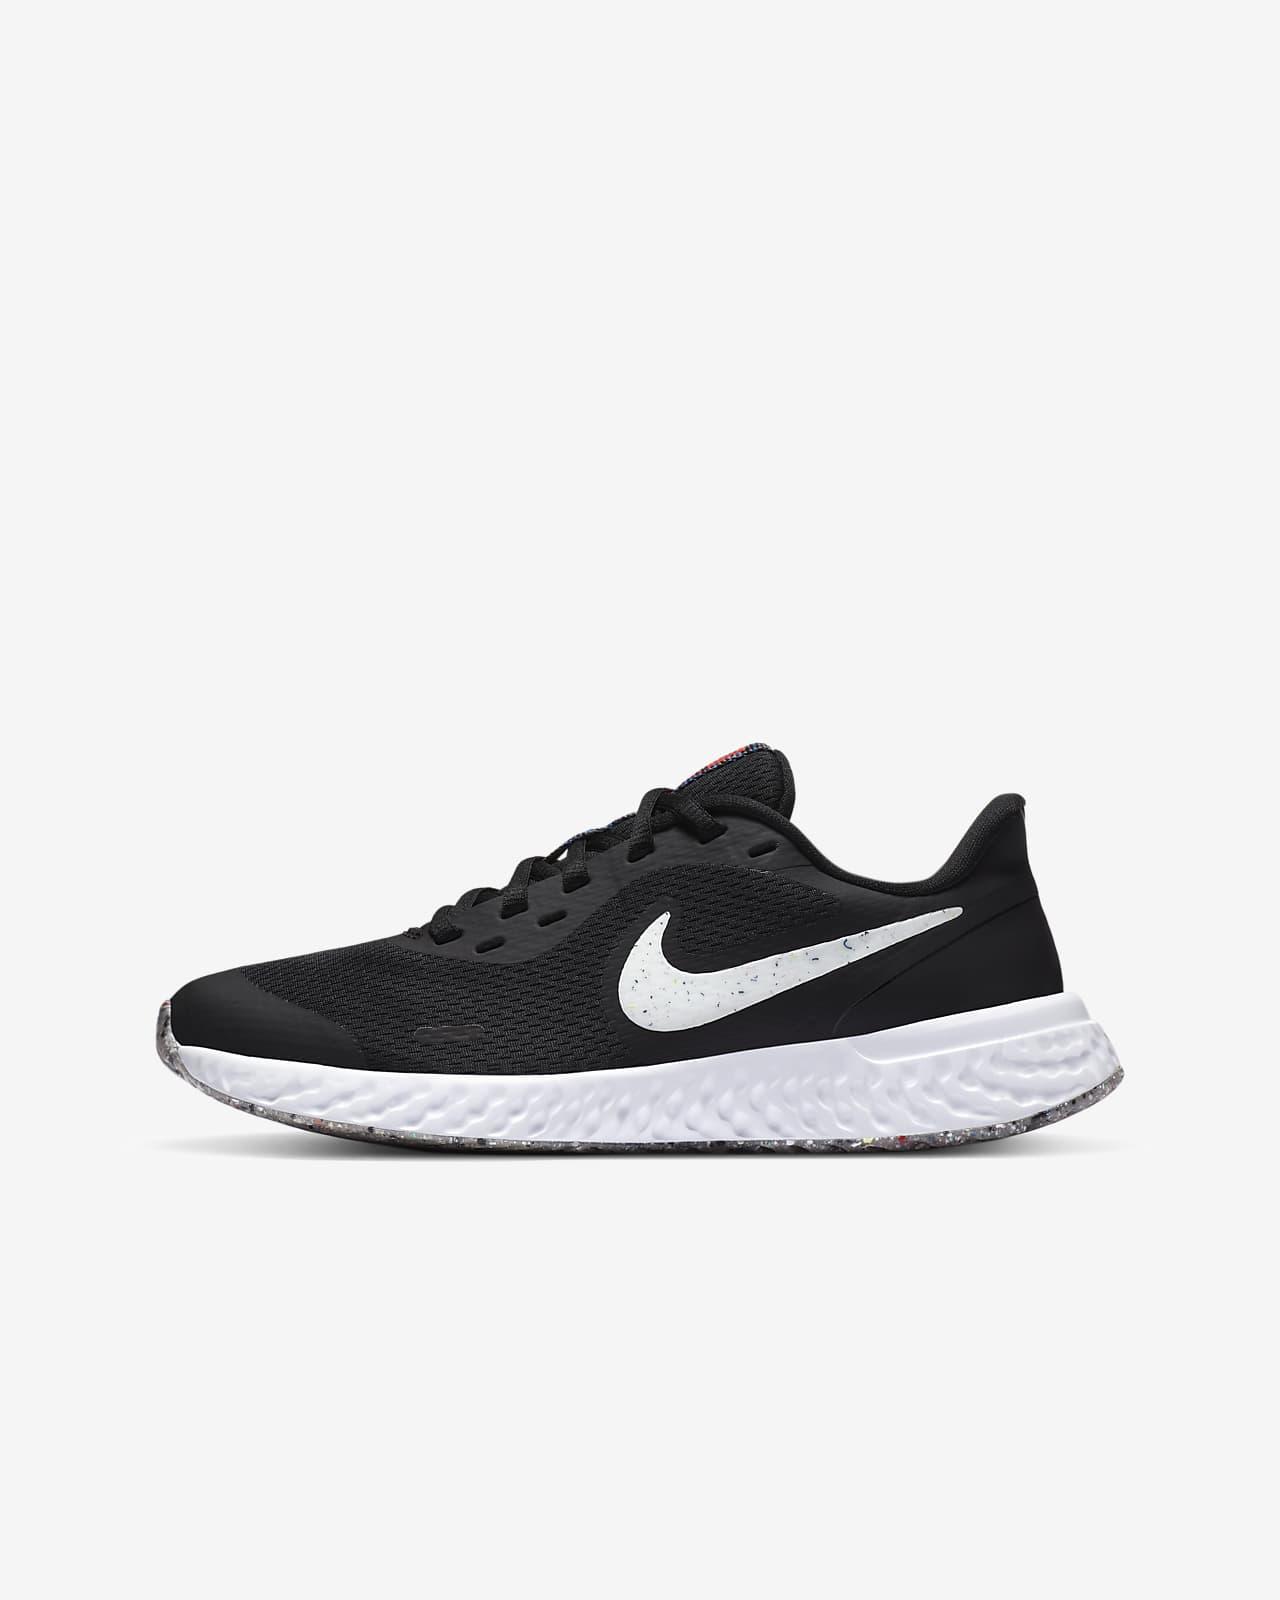 Calzado de running para niños talla grande Nike Revolution 5 SE